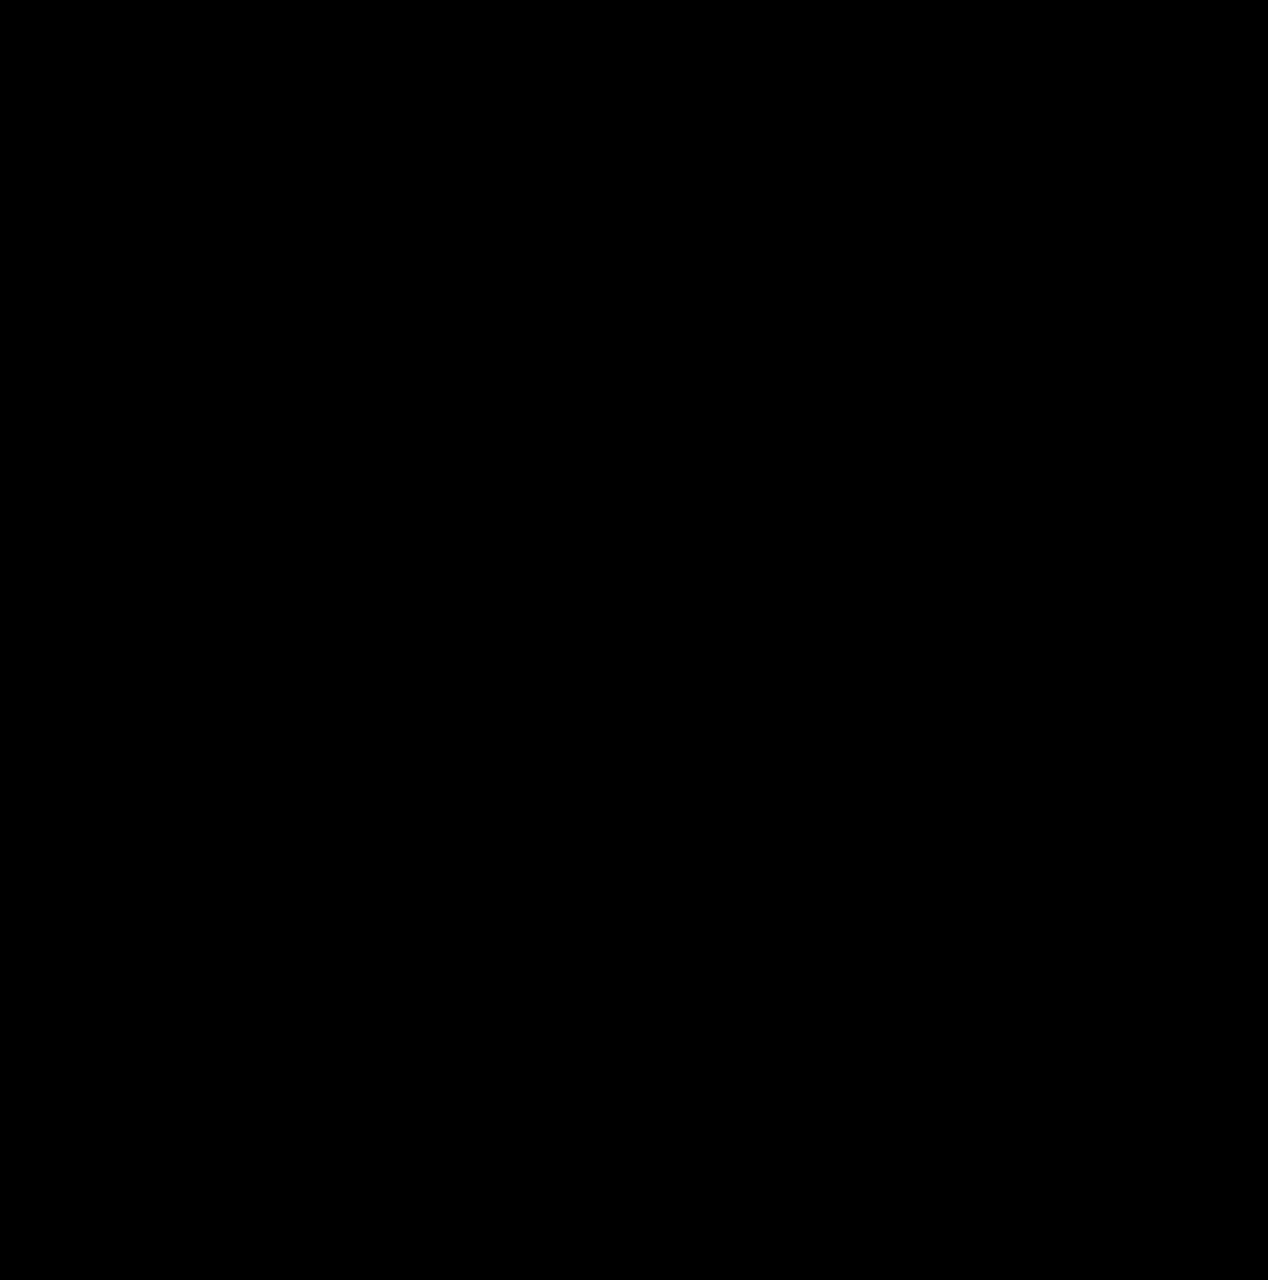 fengshui-chi